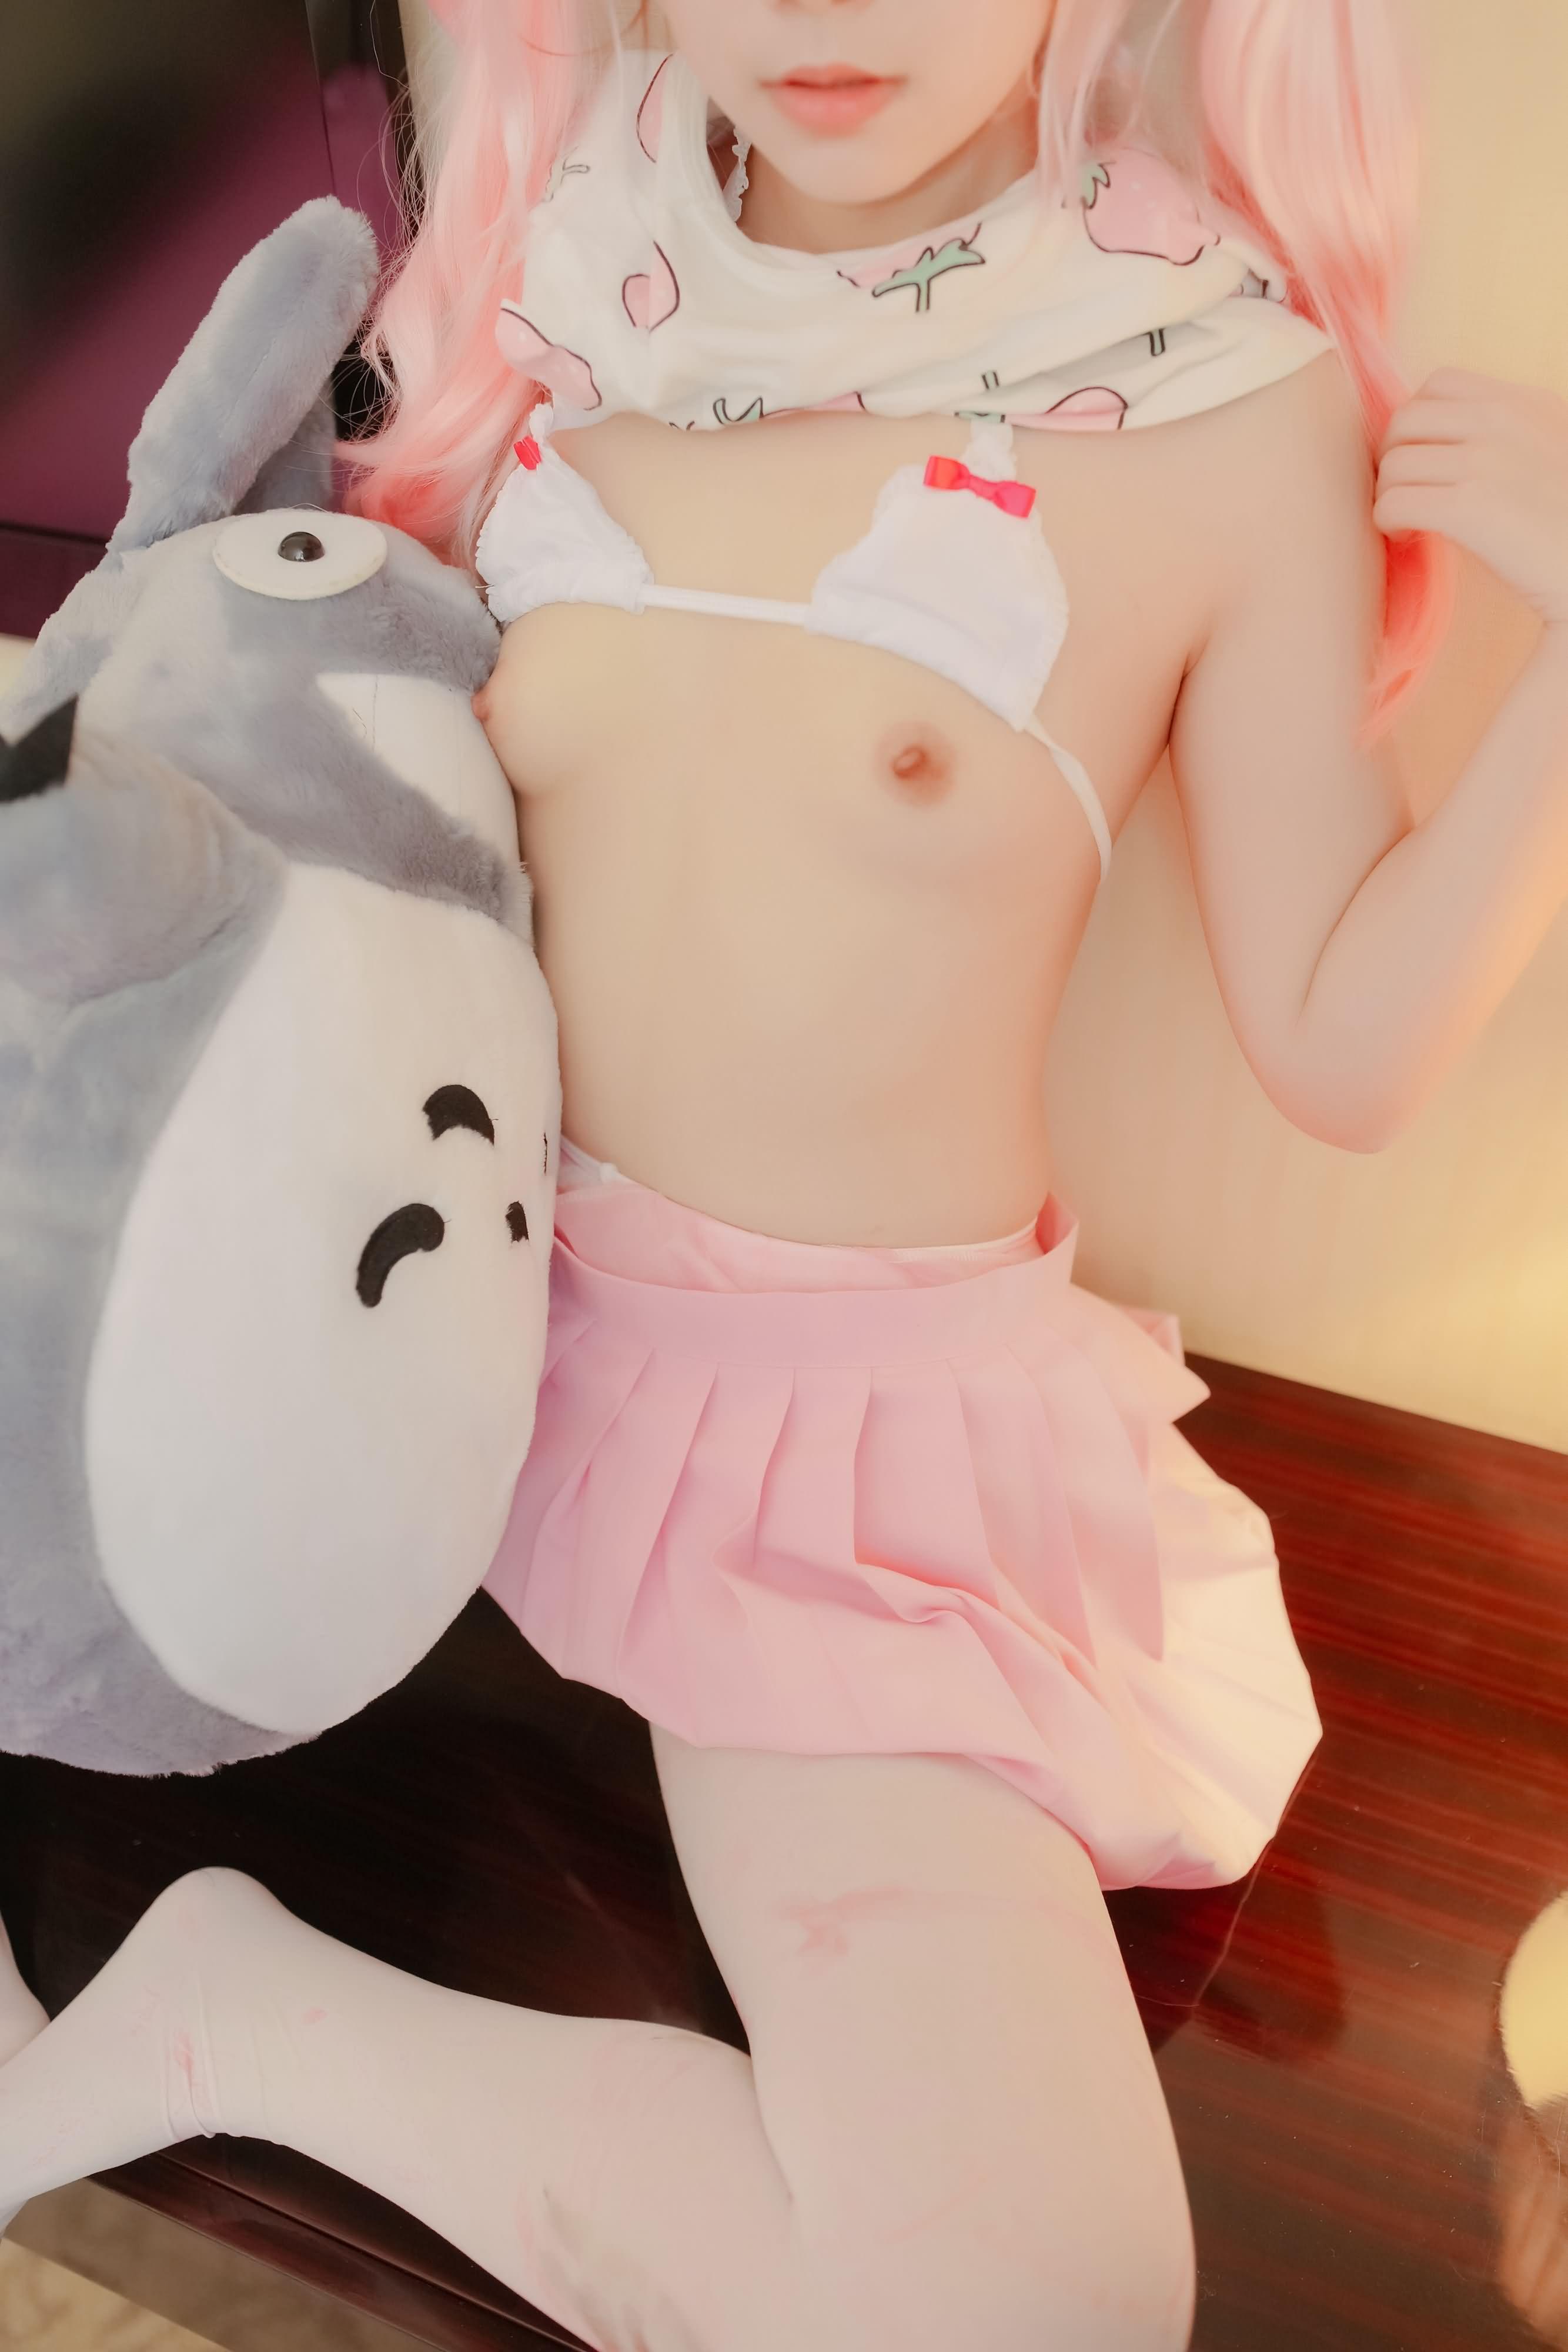 HfmyaU - 【The Girl Theater】 少女映画 Cosplay 龙猫与少女 90P